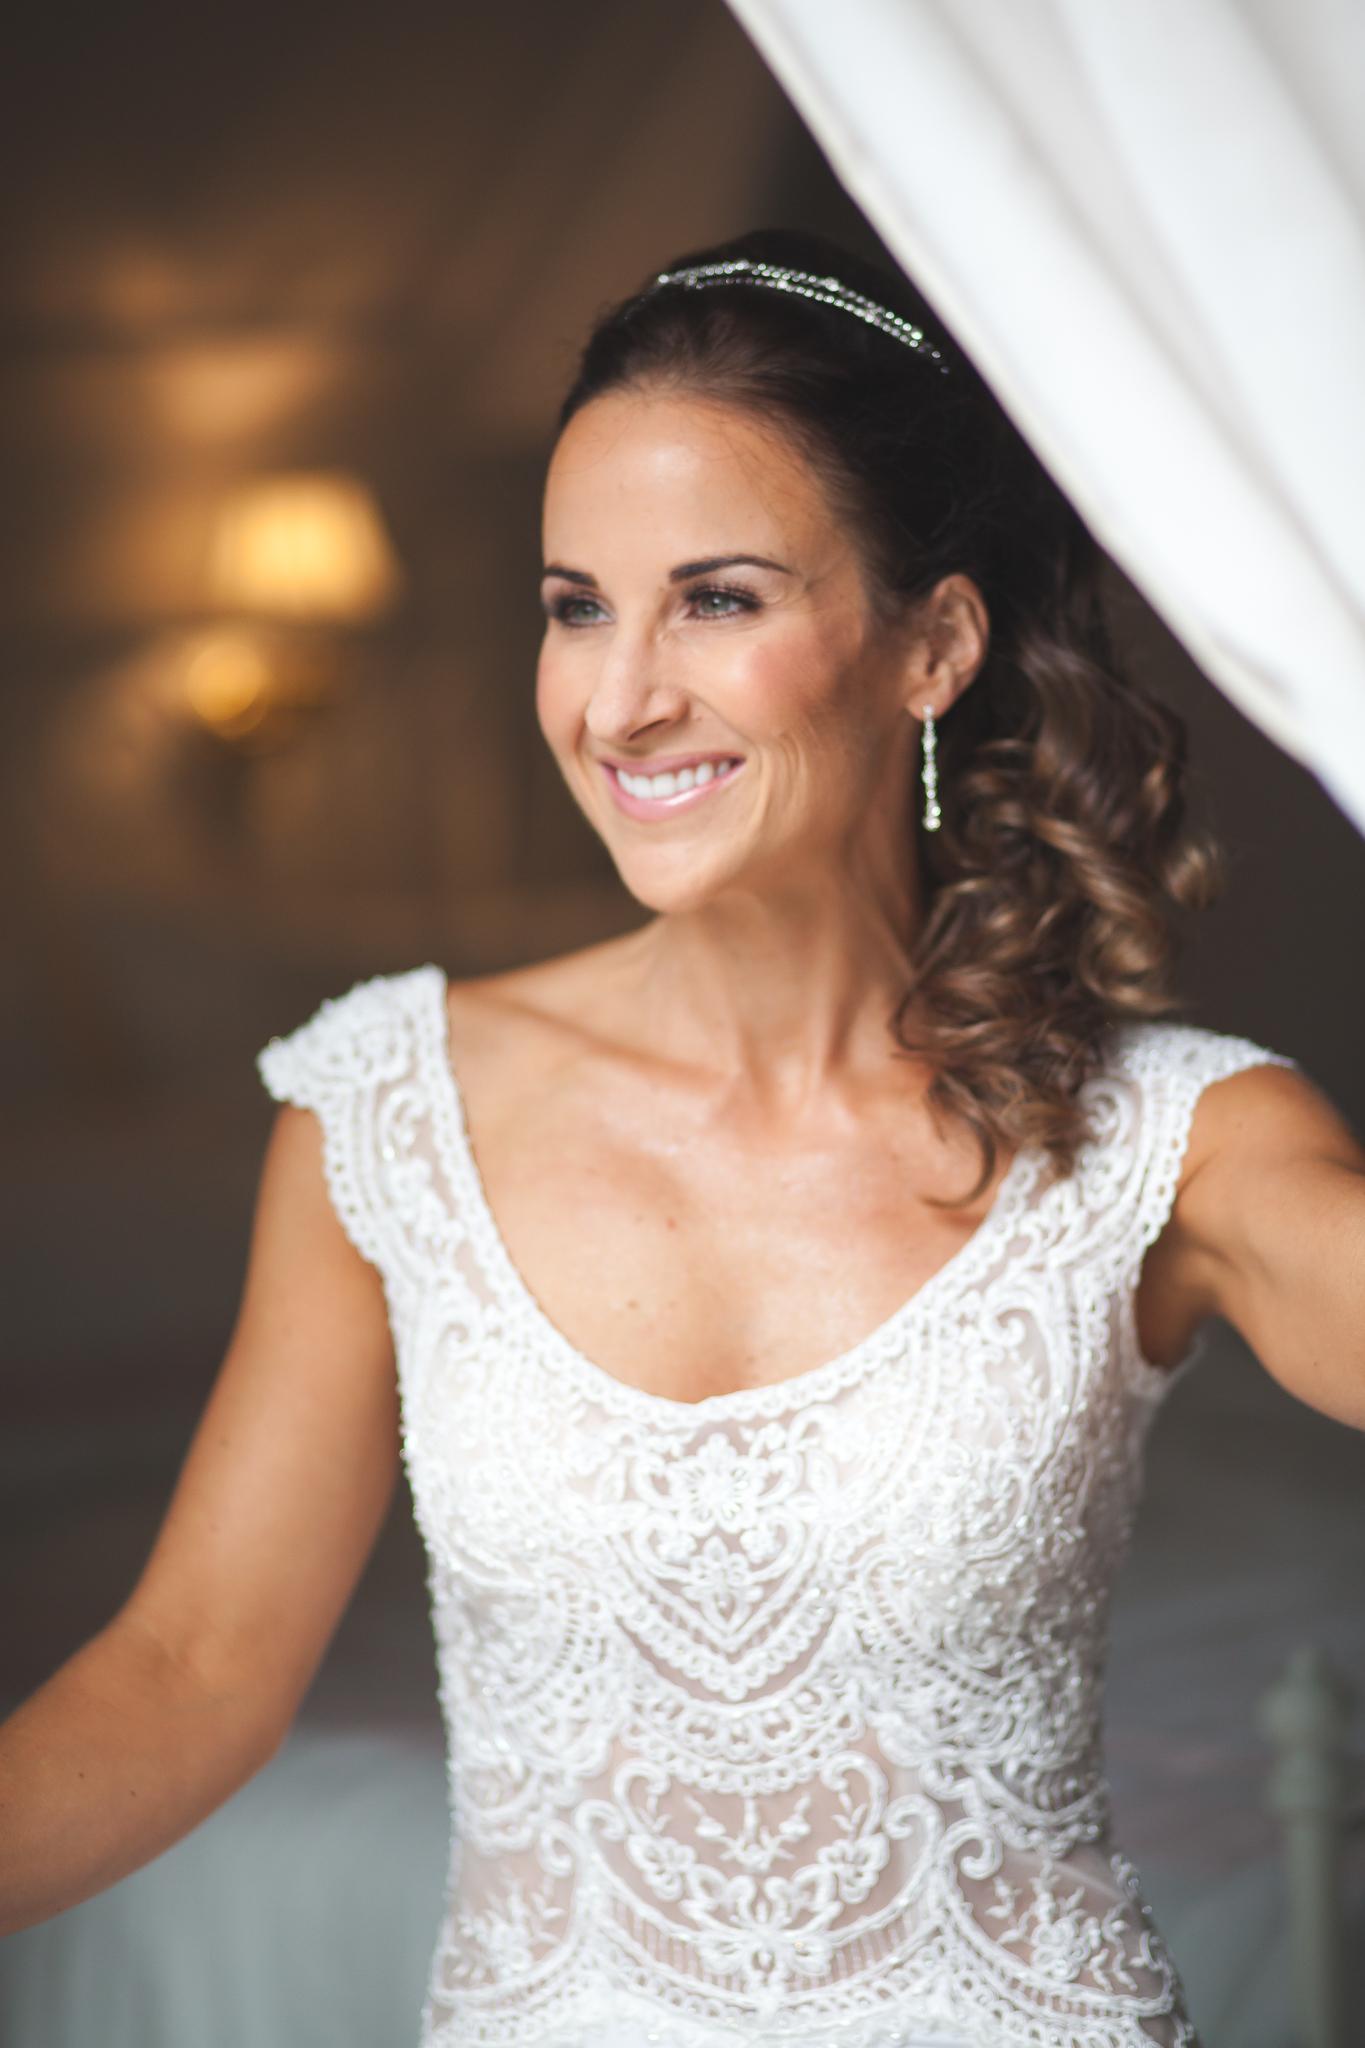 Amy D Photography- Barrie Wedding Photography- Bride Getting Ready- Muskoka Wedding Photography- Best Wedding Photographers (91 of 130).jpg